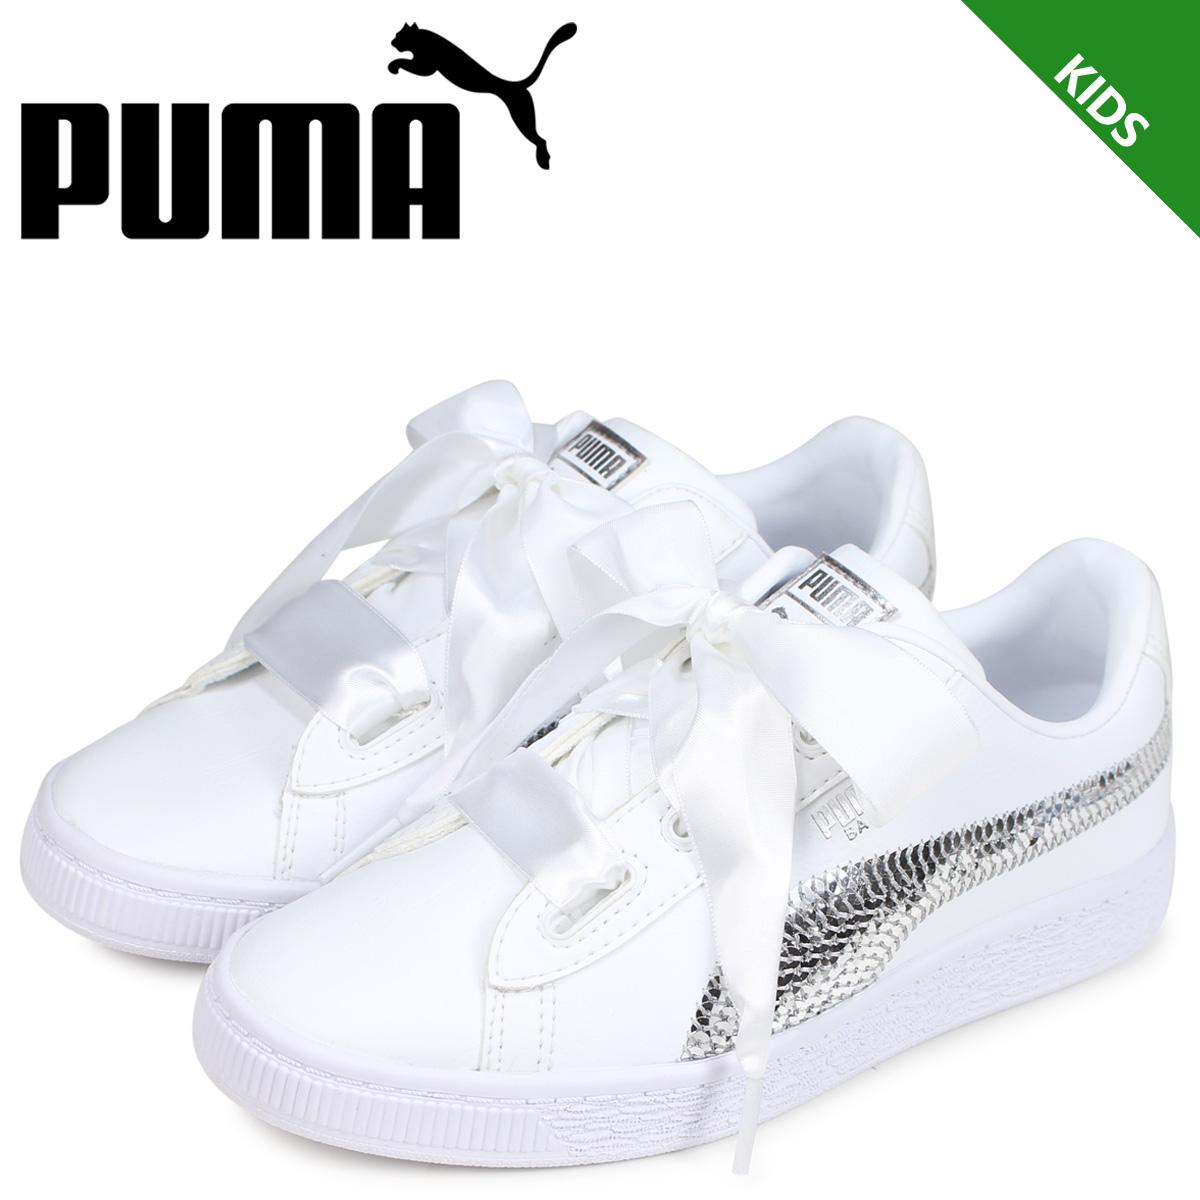 puma basket bling